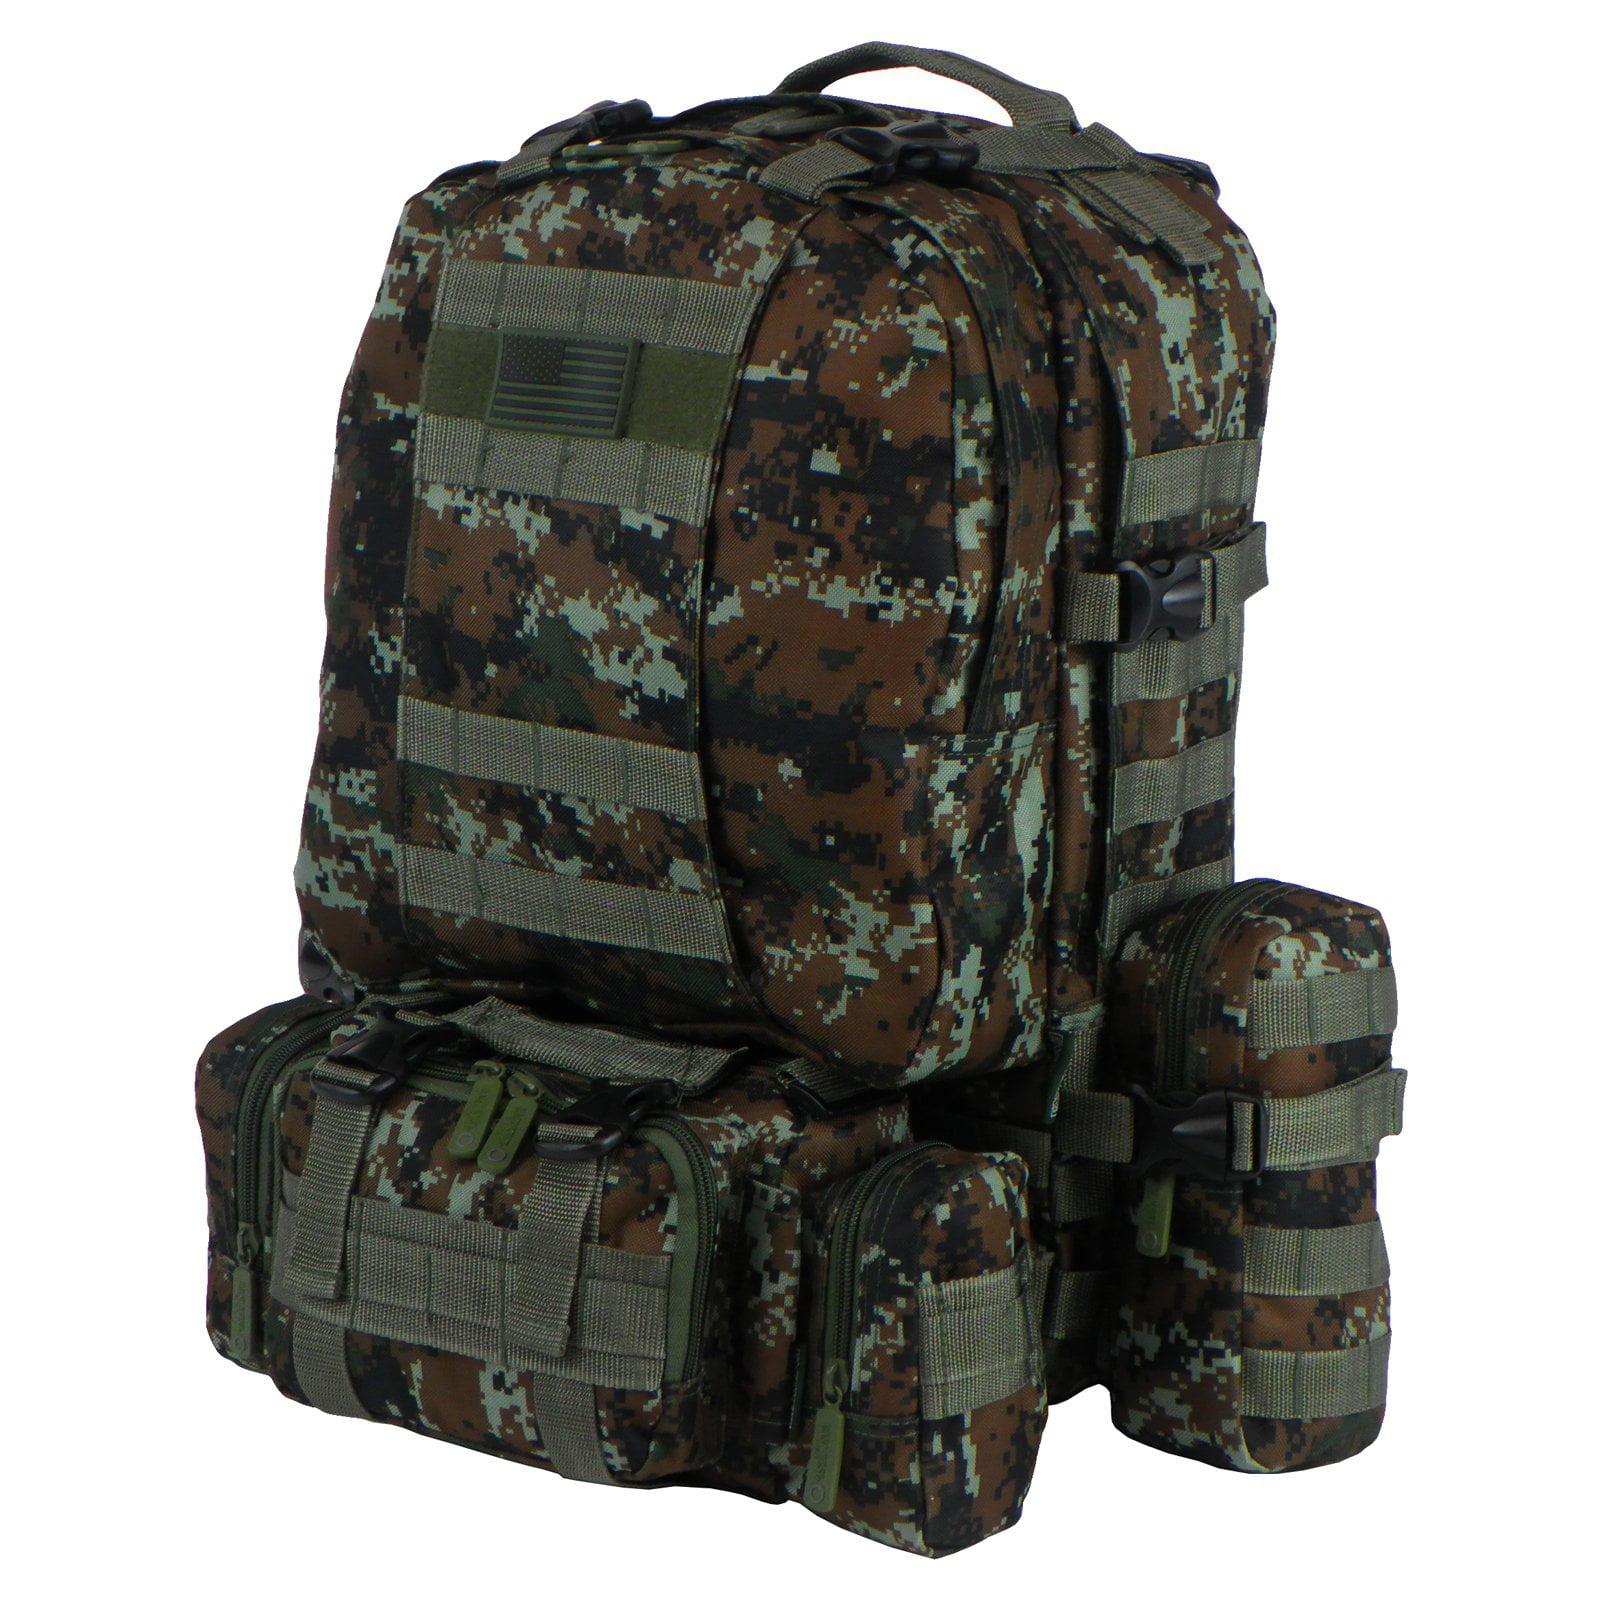 East West U.S.A. Tactical Molle Military ACU Rucksack Tre...